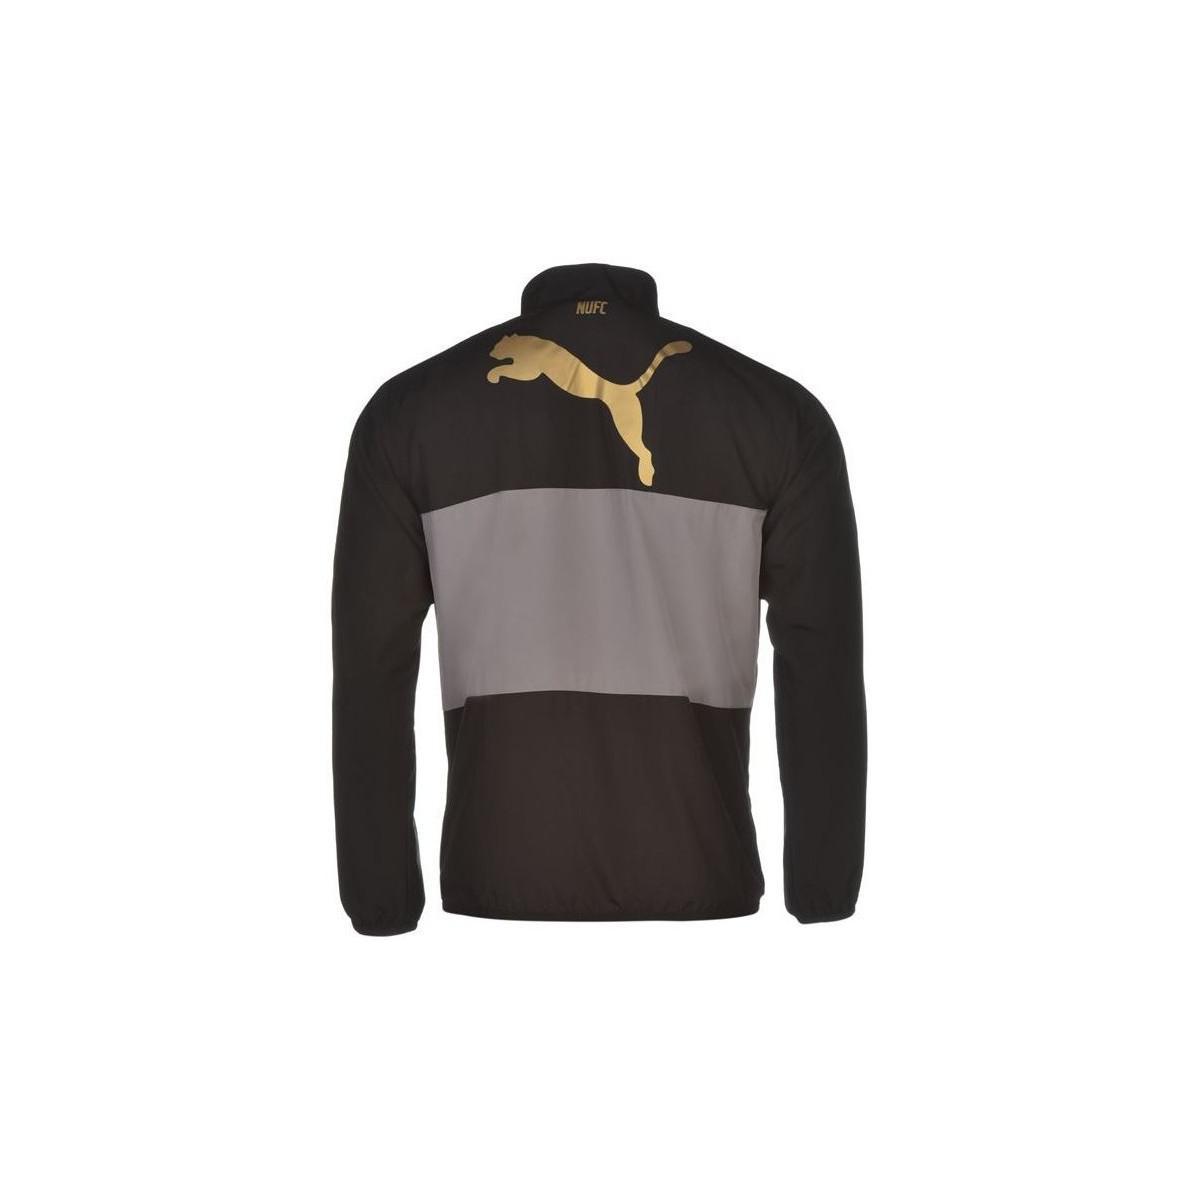 0188049ab72c0 2016-2017 Newcastle Leisure Jacket - Kids Men's Tracksuit Jacket In Black